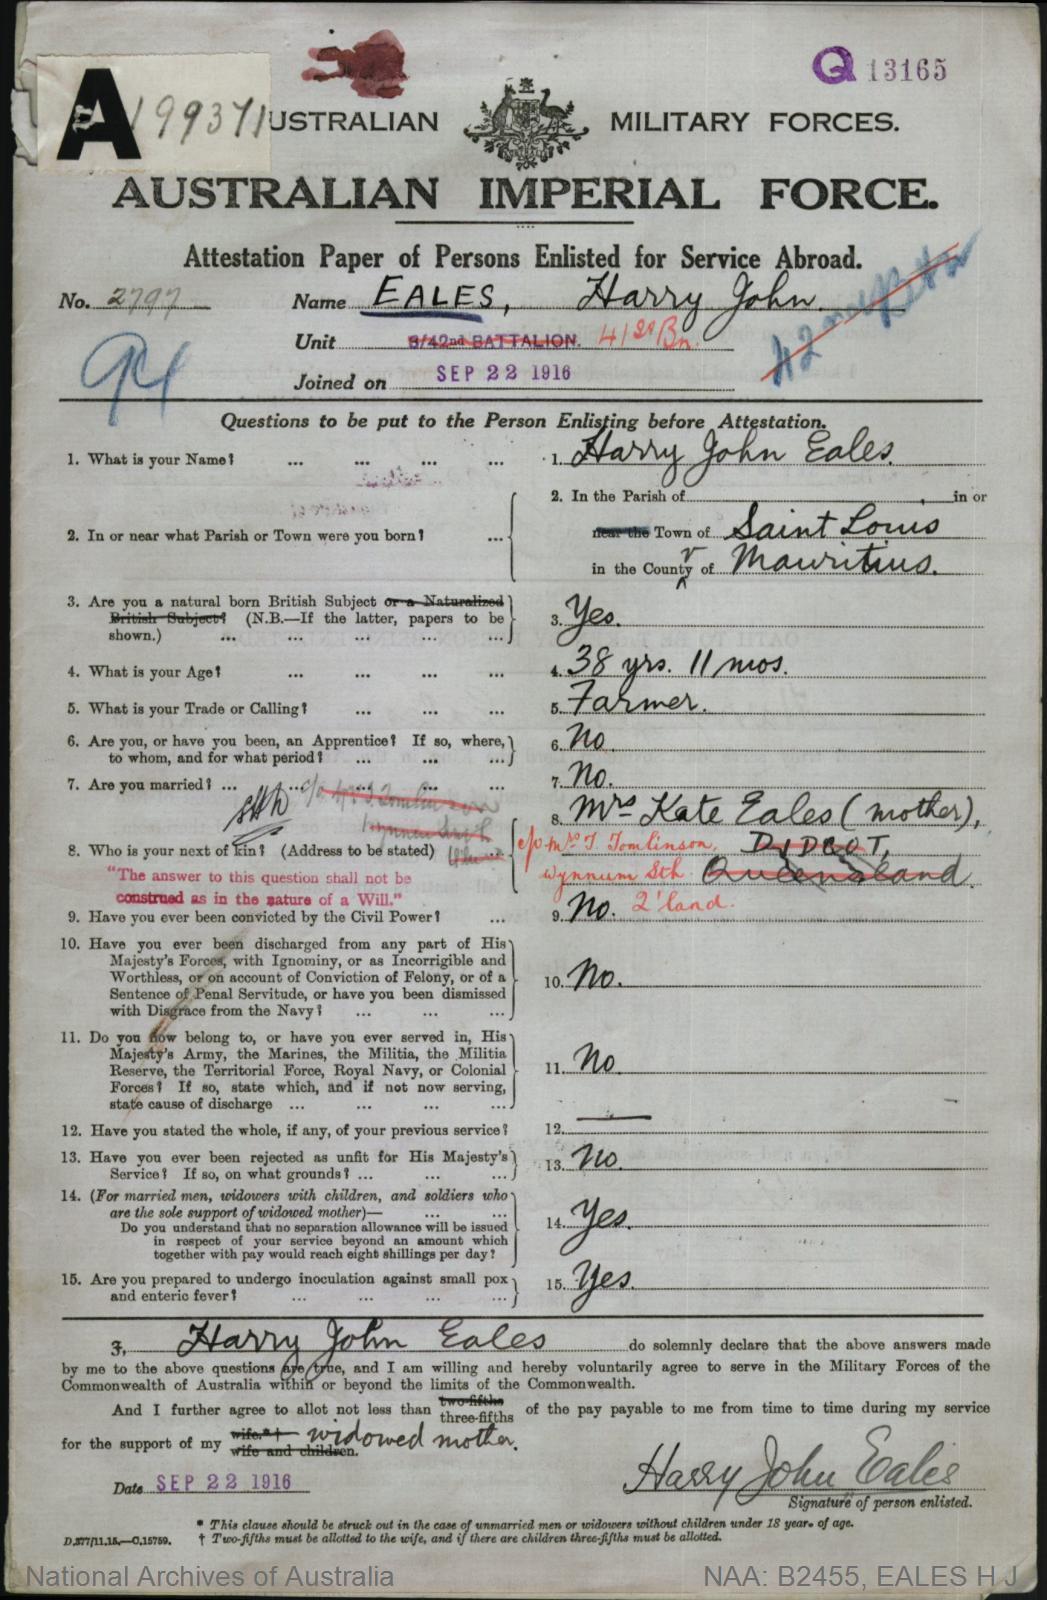 Eales Harry John : SERN 2797 : POB Saint Louis Mauritius : POE Maryborough QLD : NOK M Eales Kate